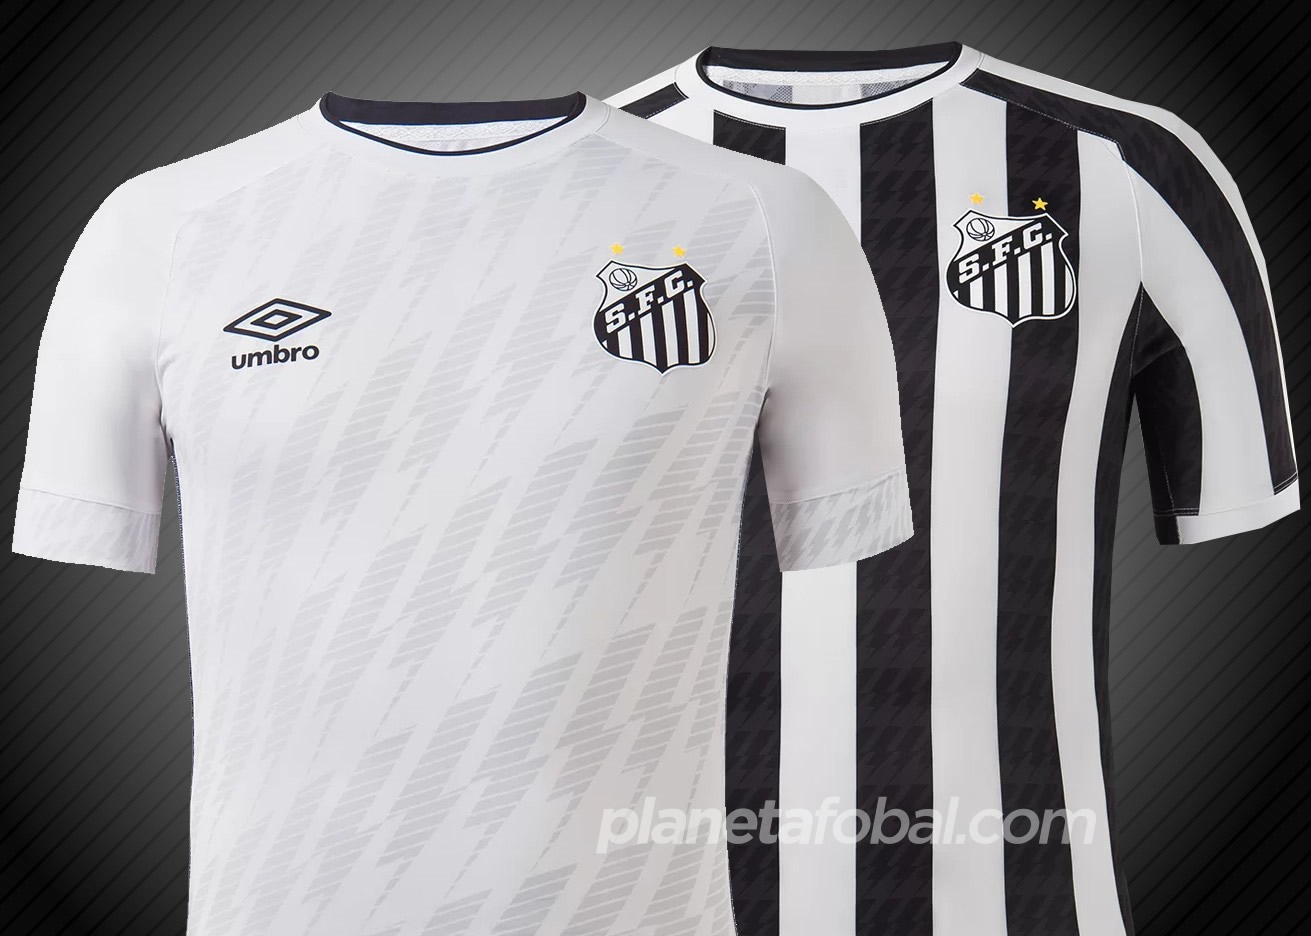 Camisetas Umbro del Santos 2021/22